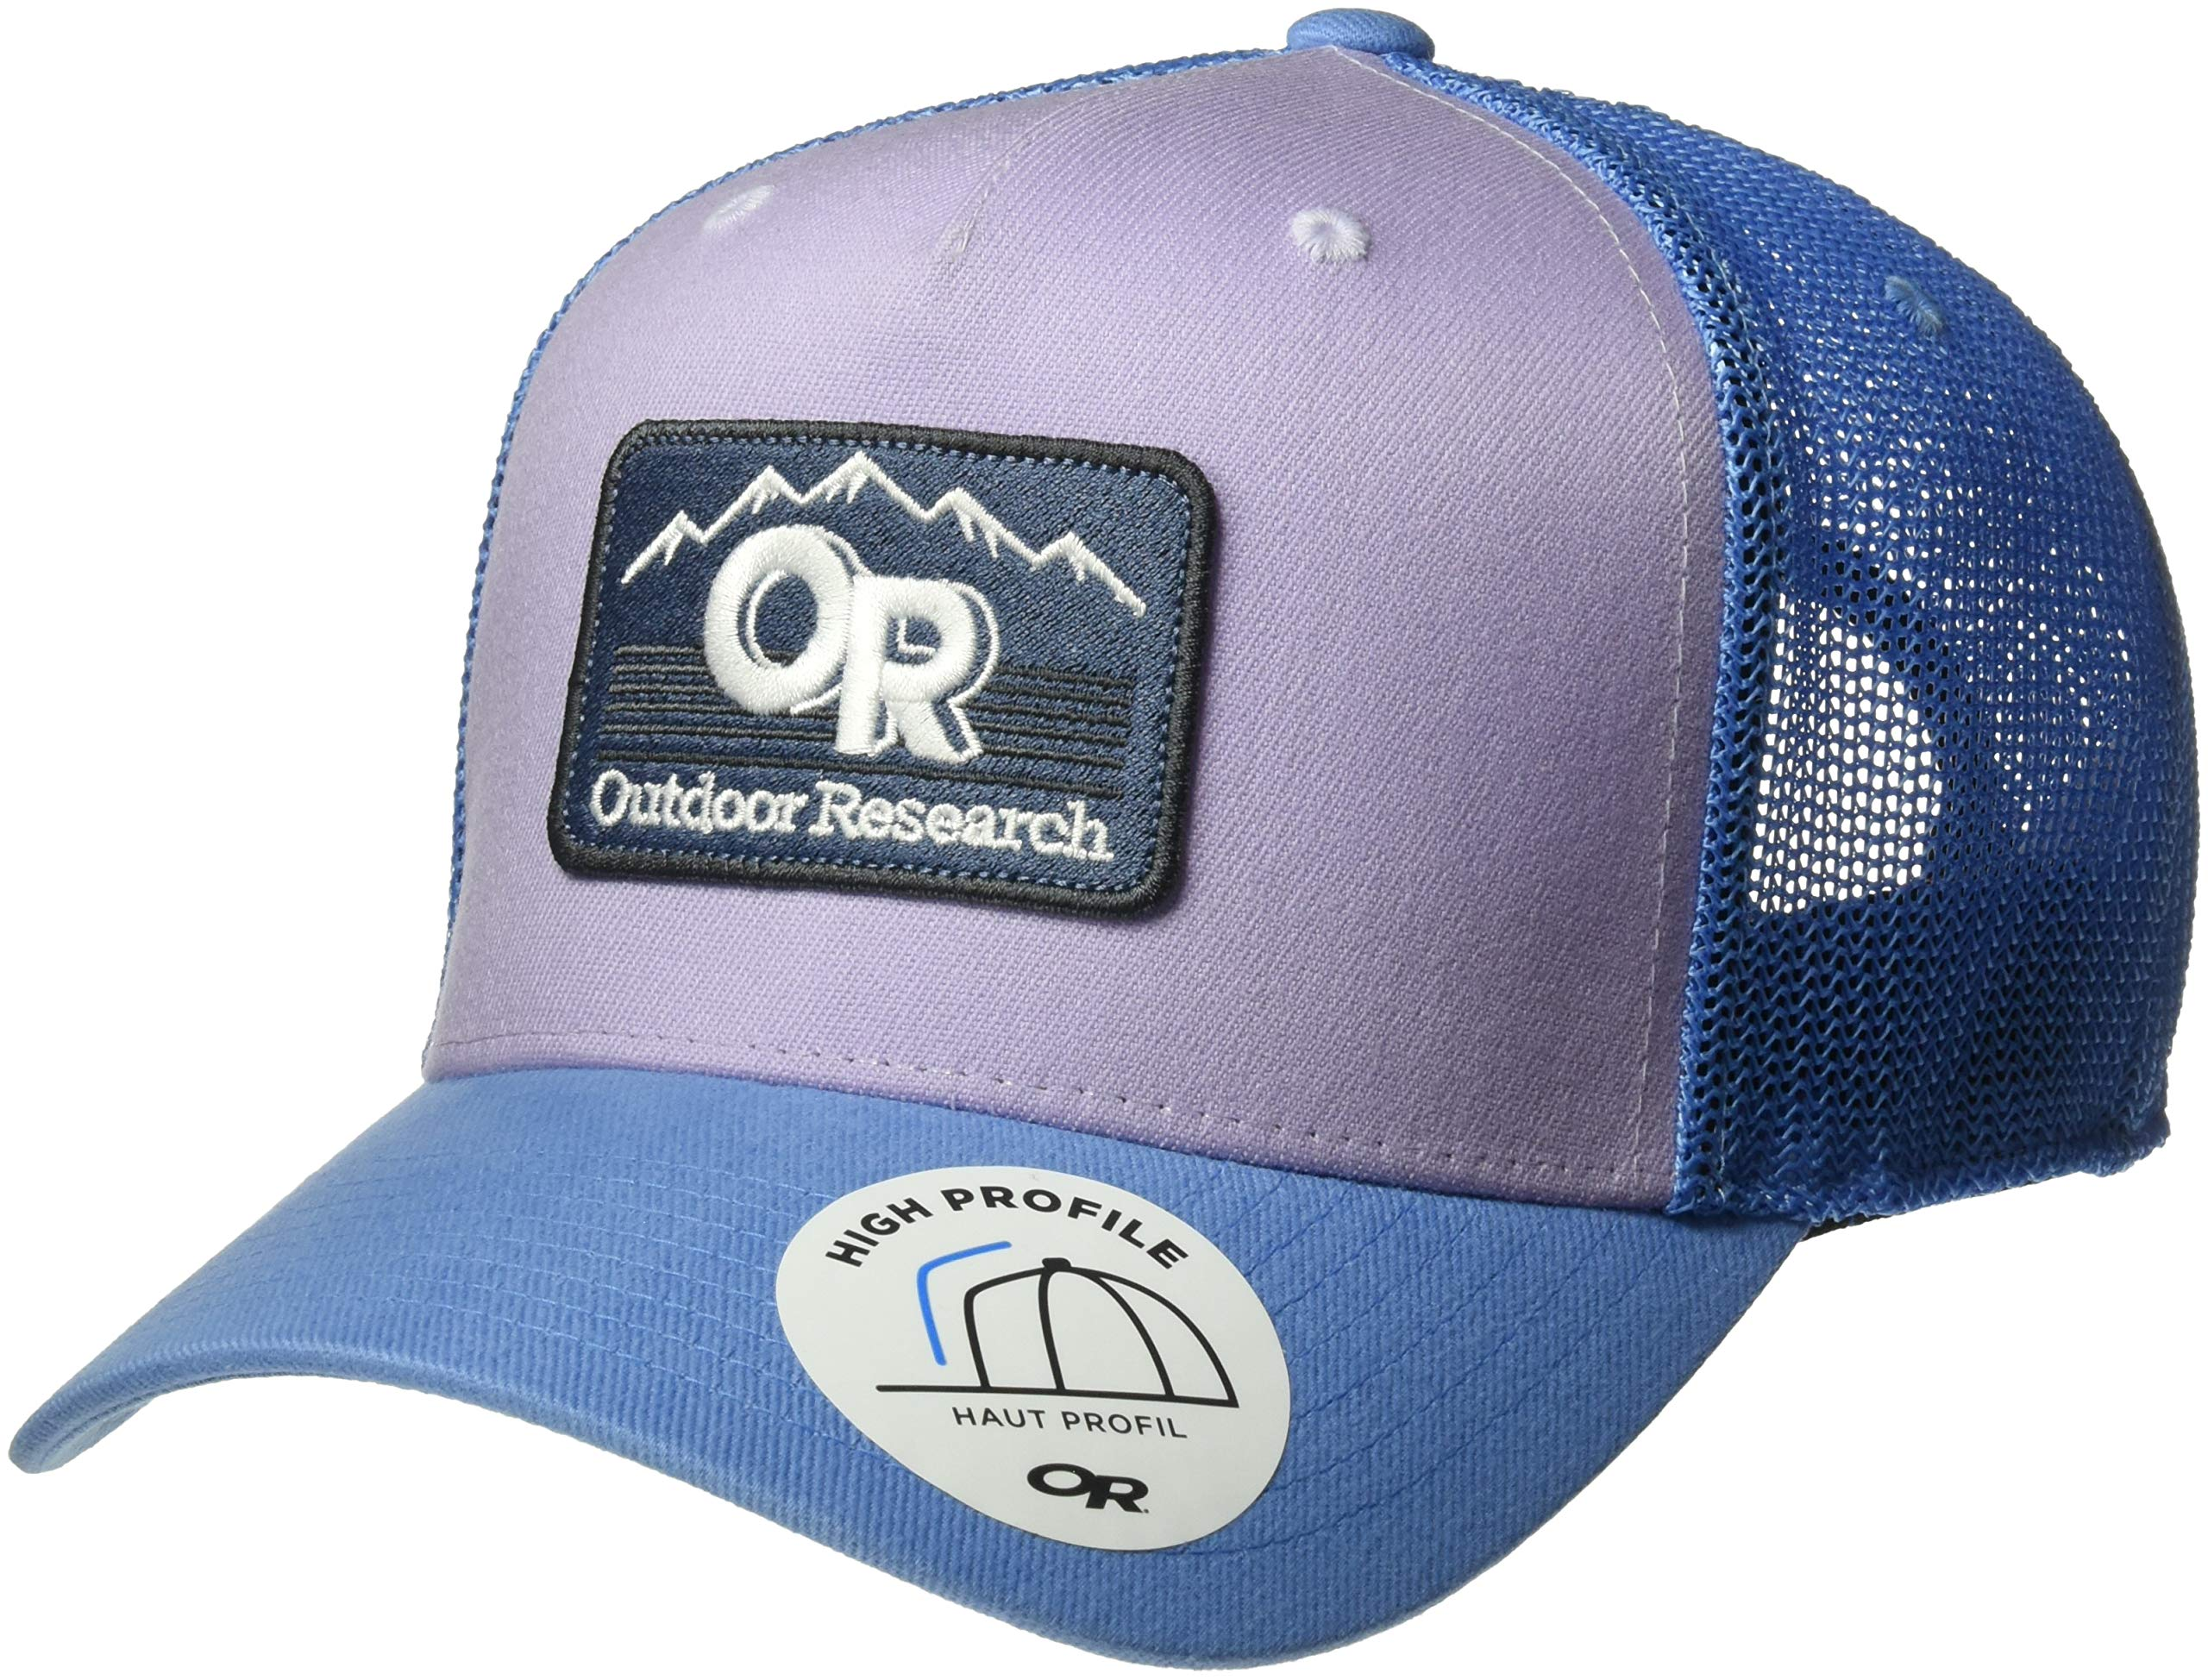 827d5f9378b591 Amazon.com: Outdoor Research: Trucker Caps